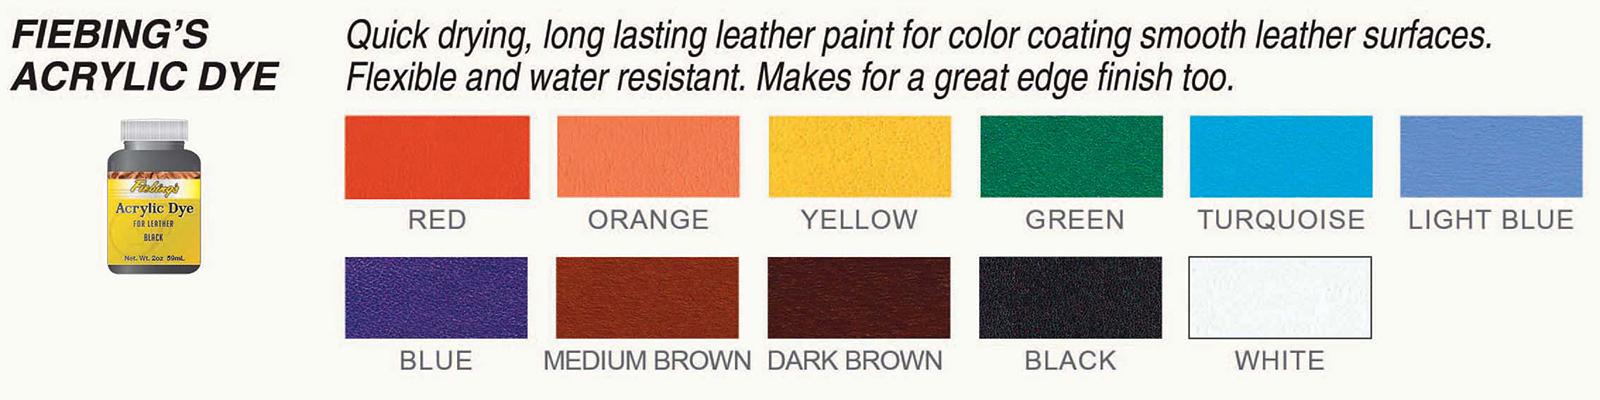 Fiebings Acrylic Dye Chart